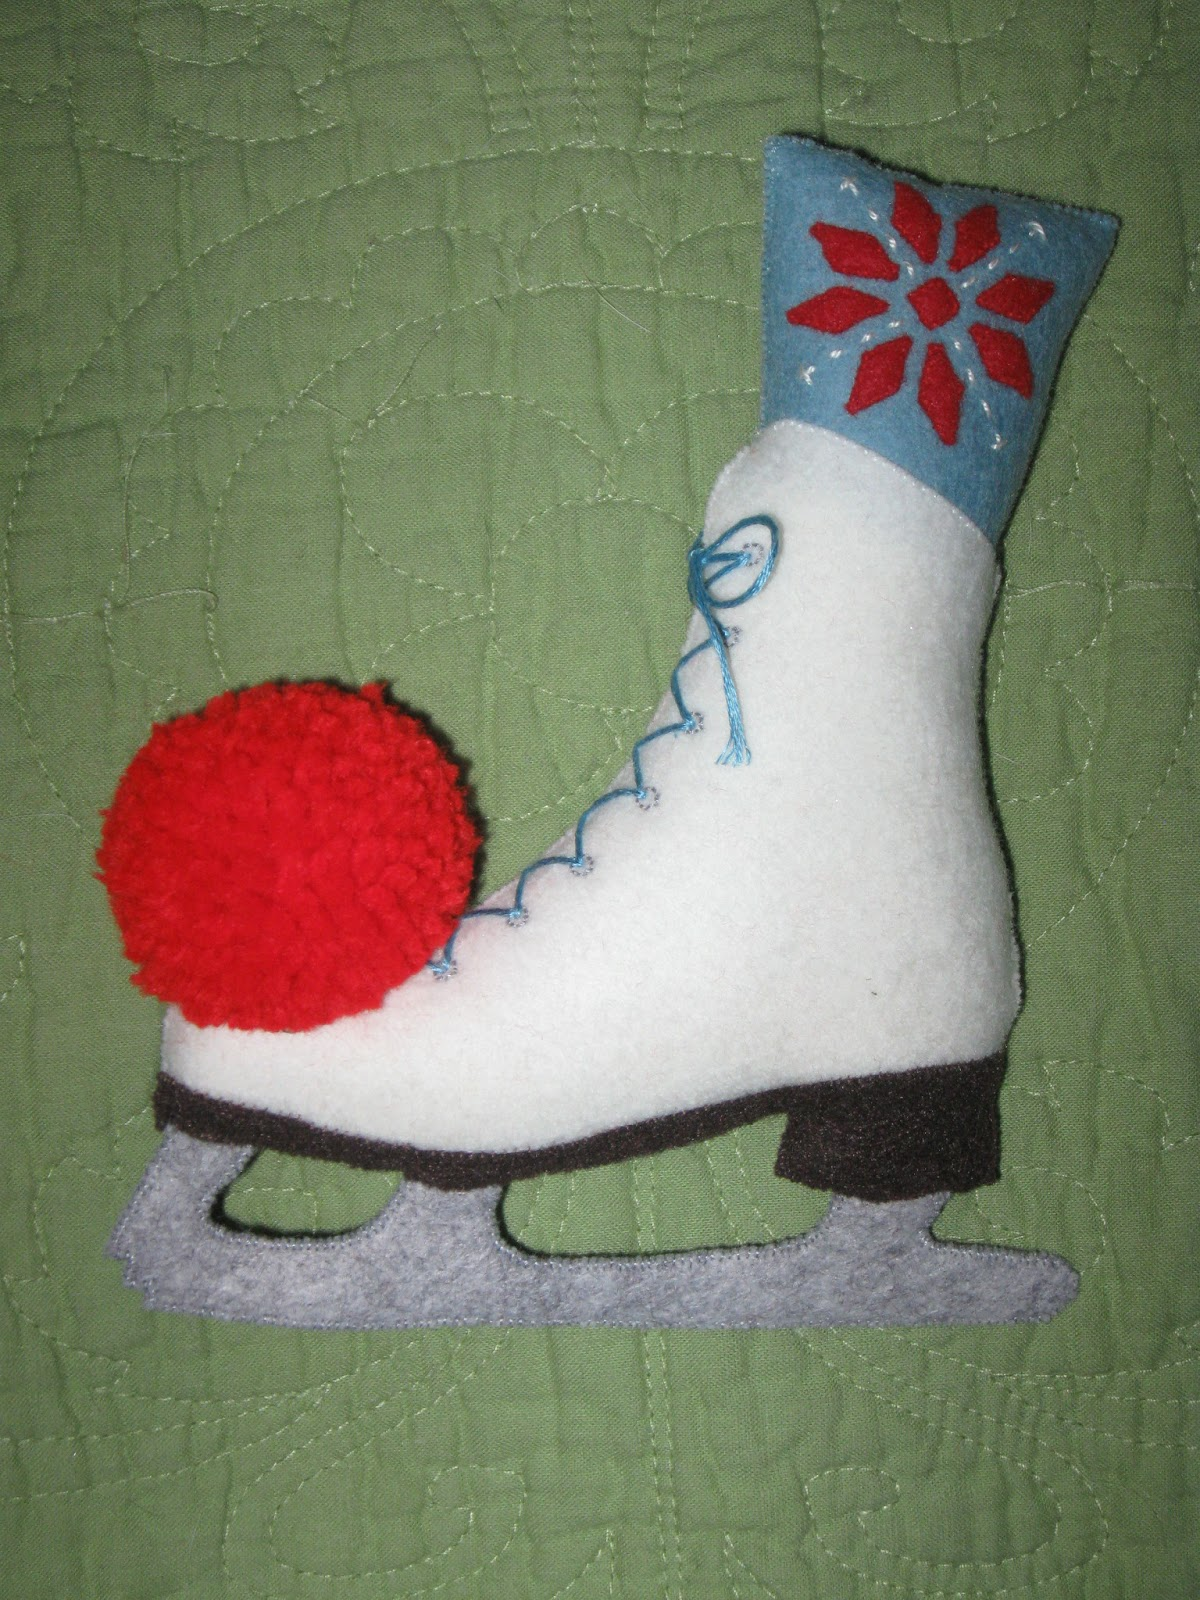 Ice Skate Cake Template